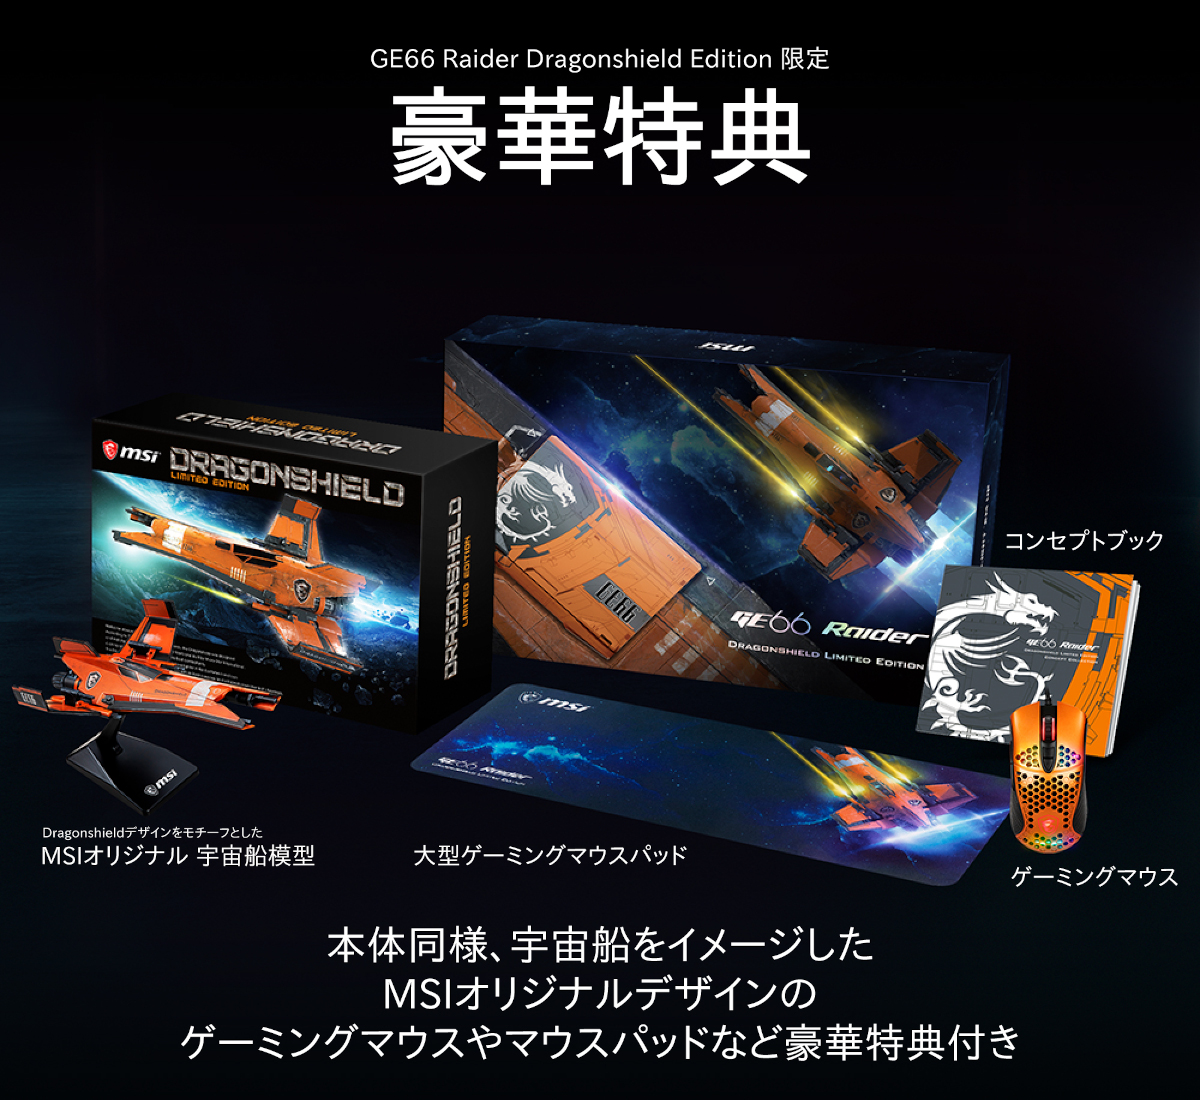 GE66 Raider Dragonshield Limited Edition